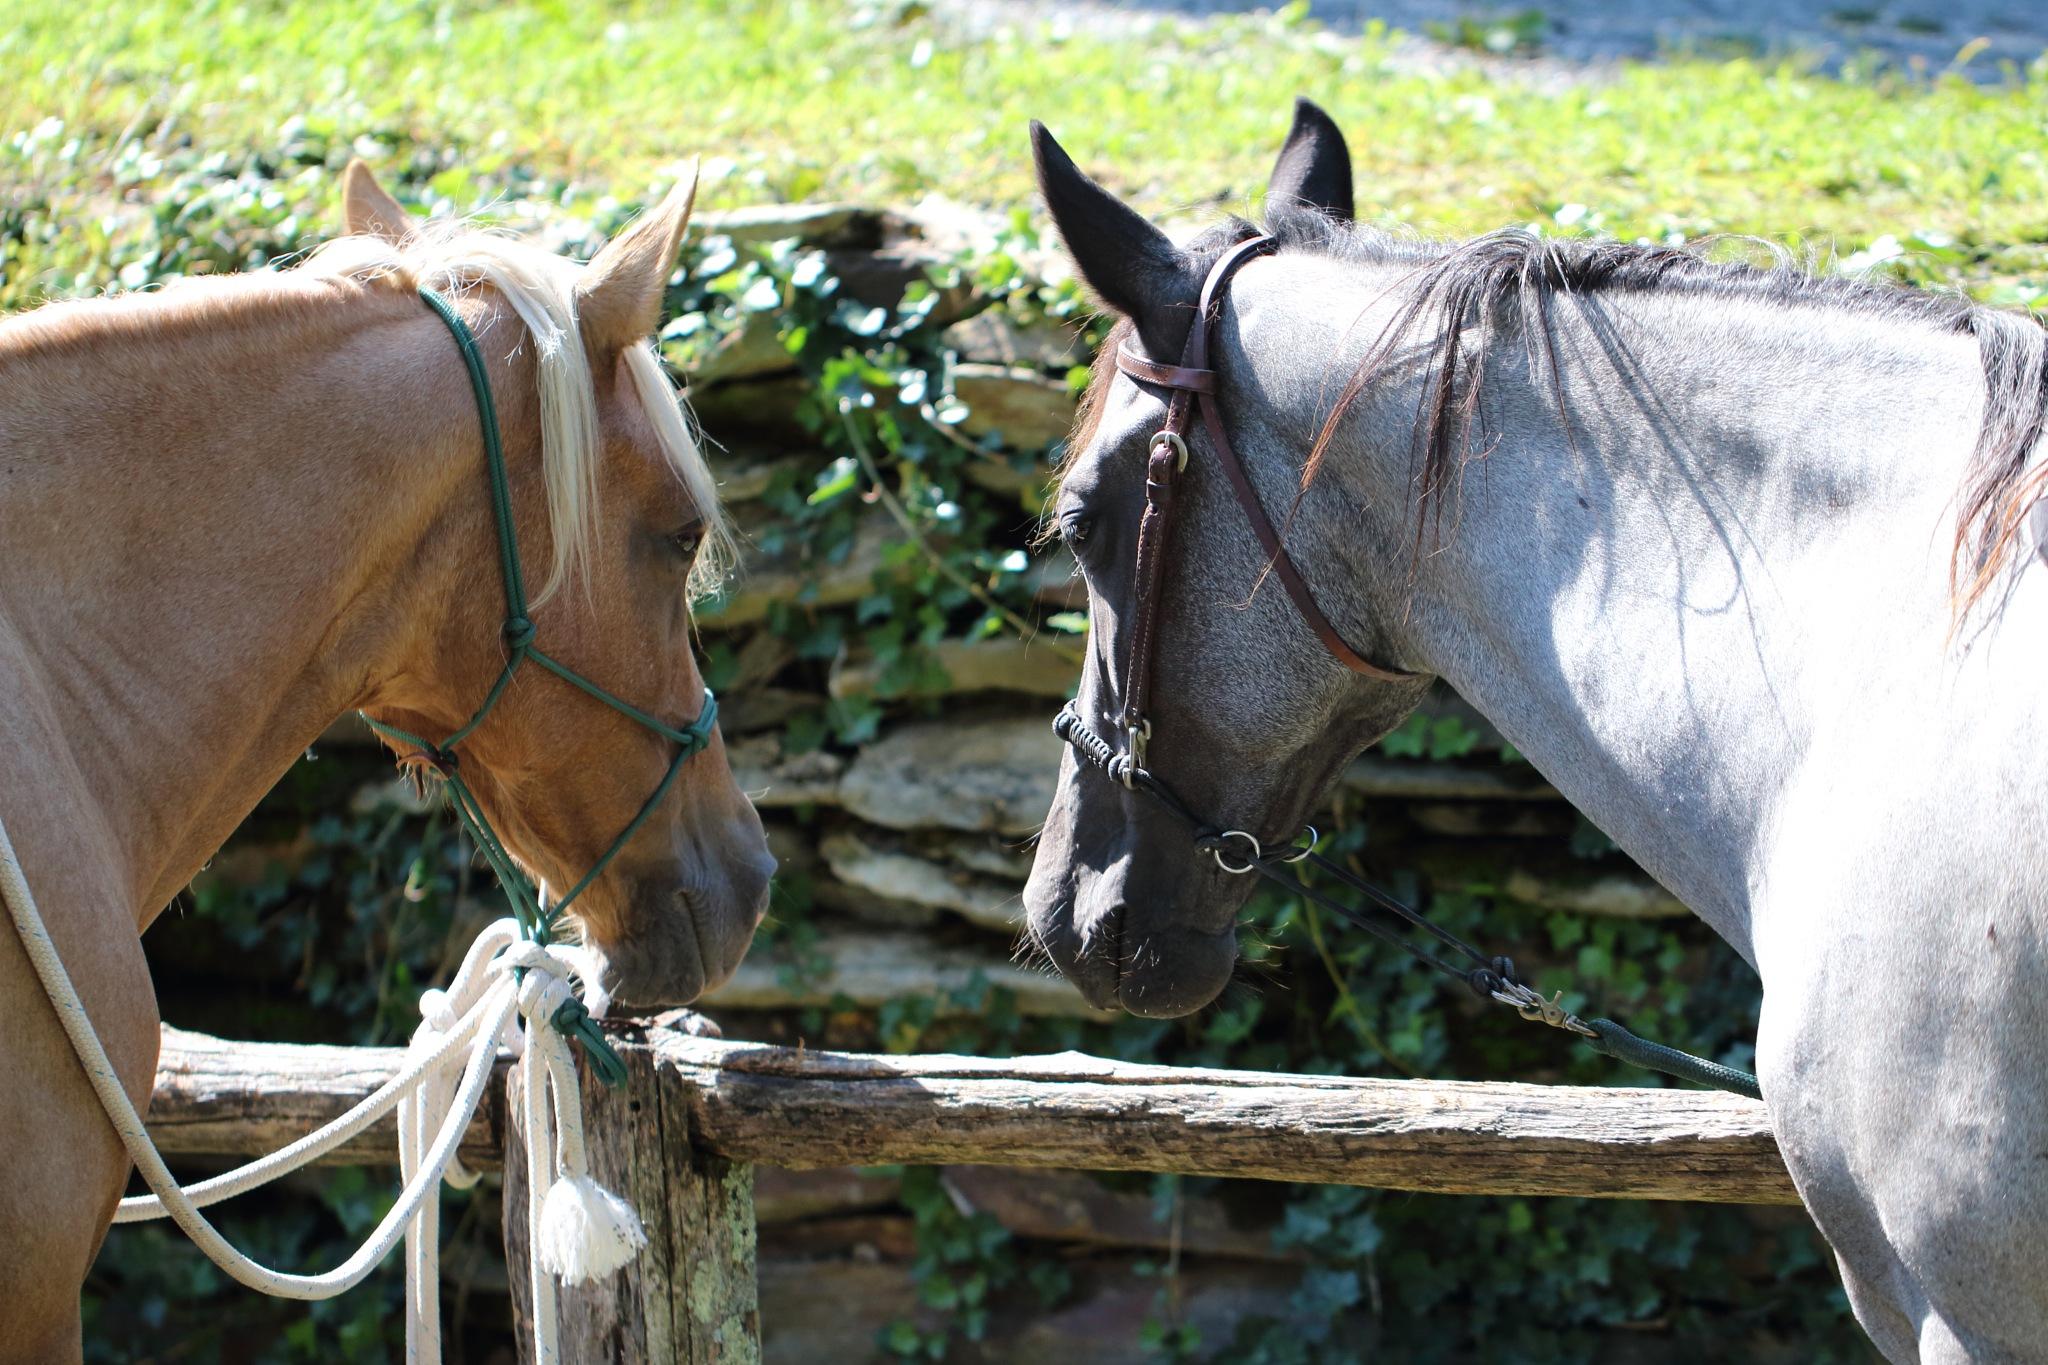 Horse talk by Ronald Woodward